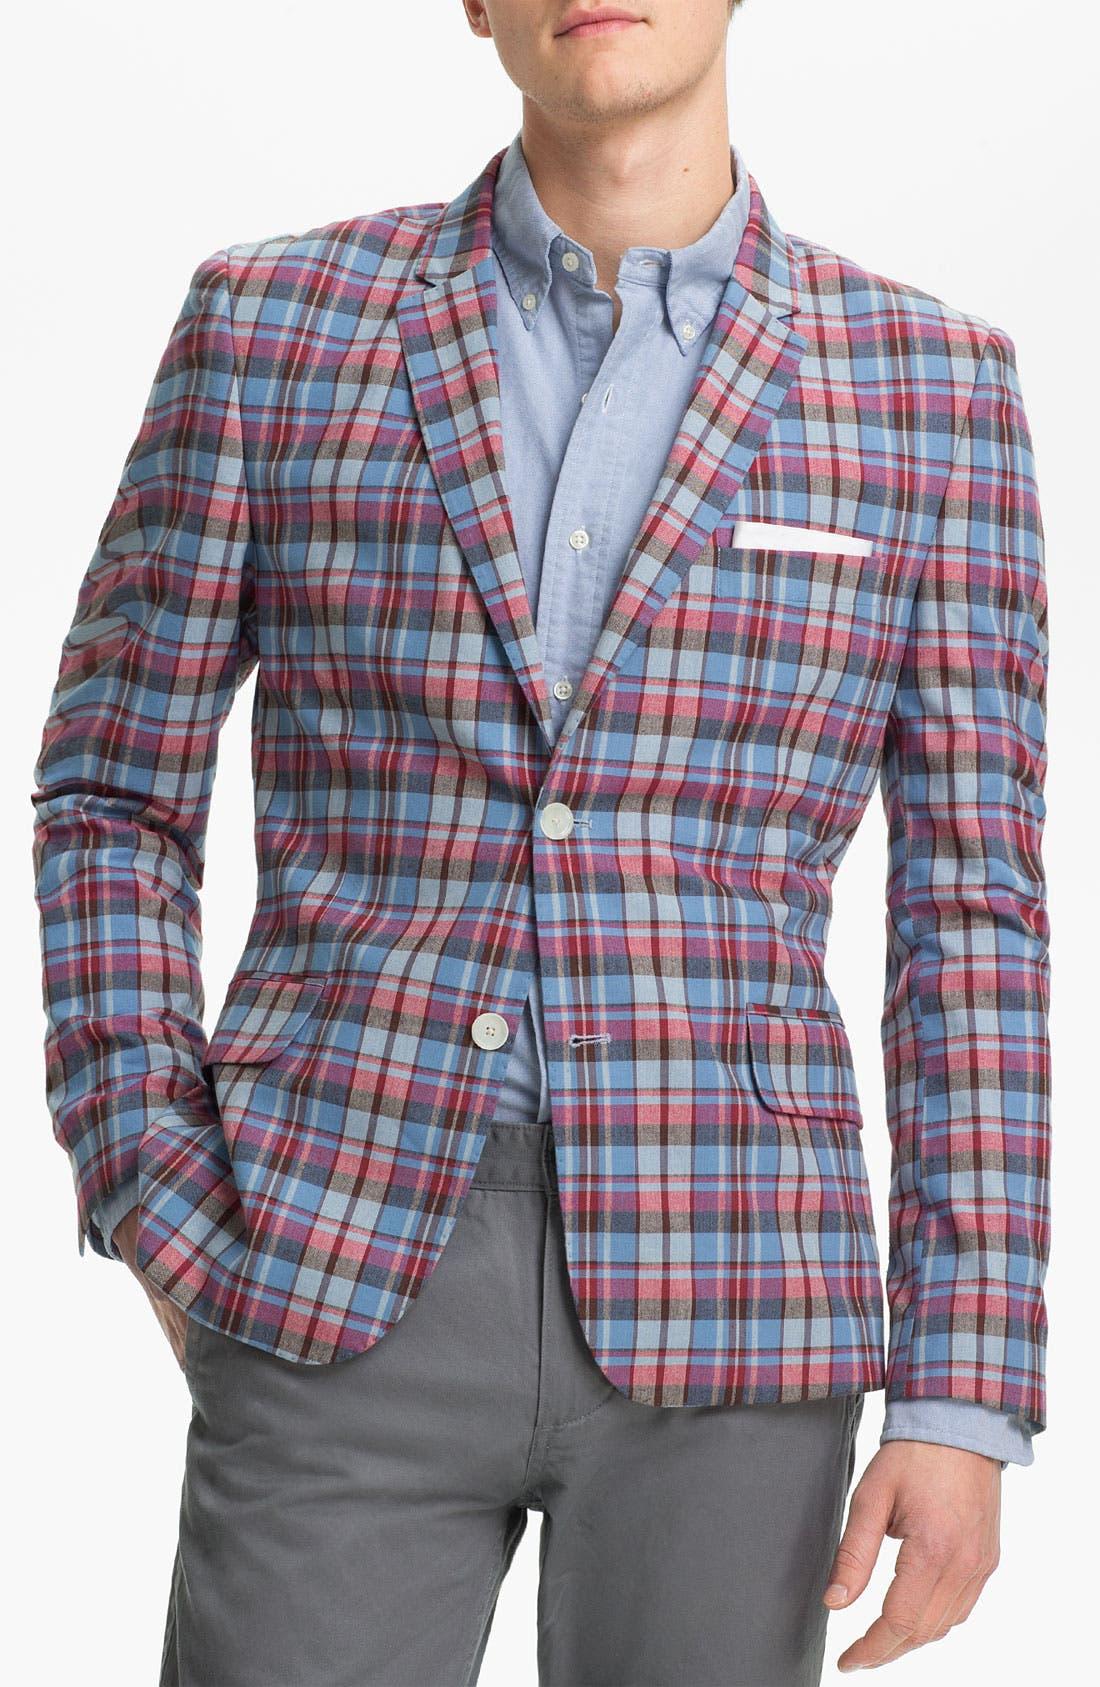 Main Image - John W. Nordstrom® Madras Cotton Sportcoat